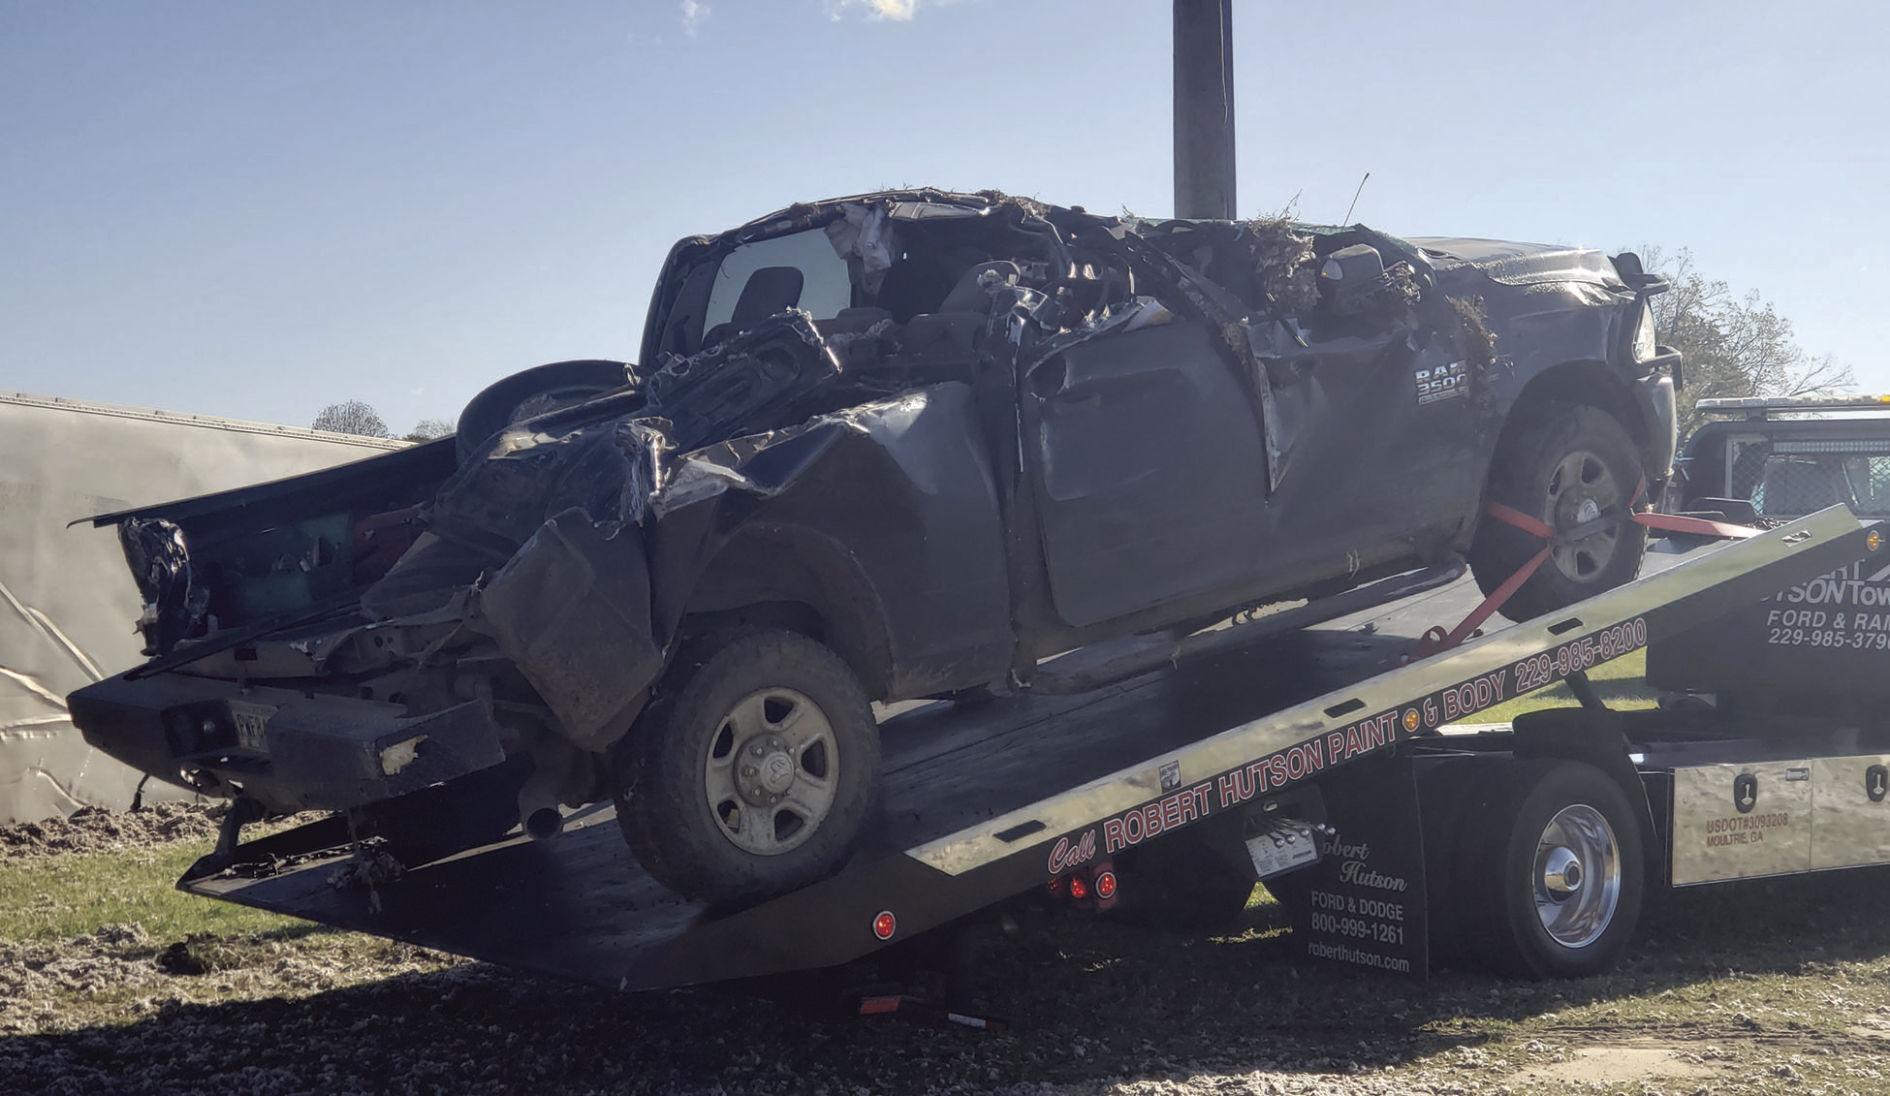 Semi Pickup Truck Crash On Hwy 133 Local News Moultrieobserver Com